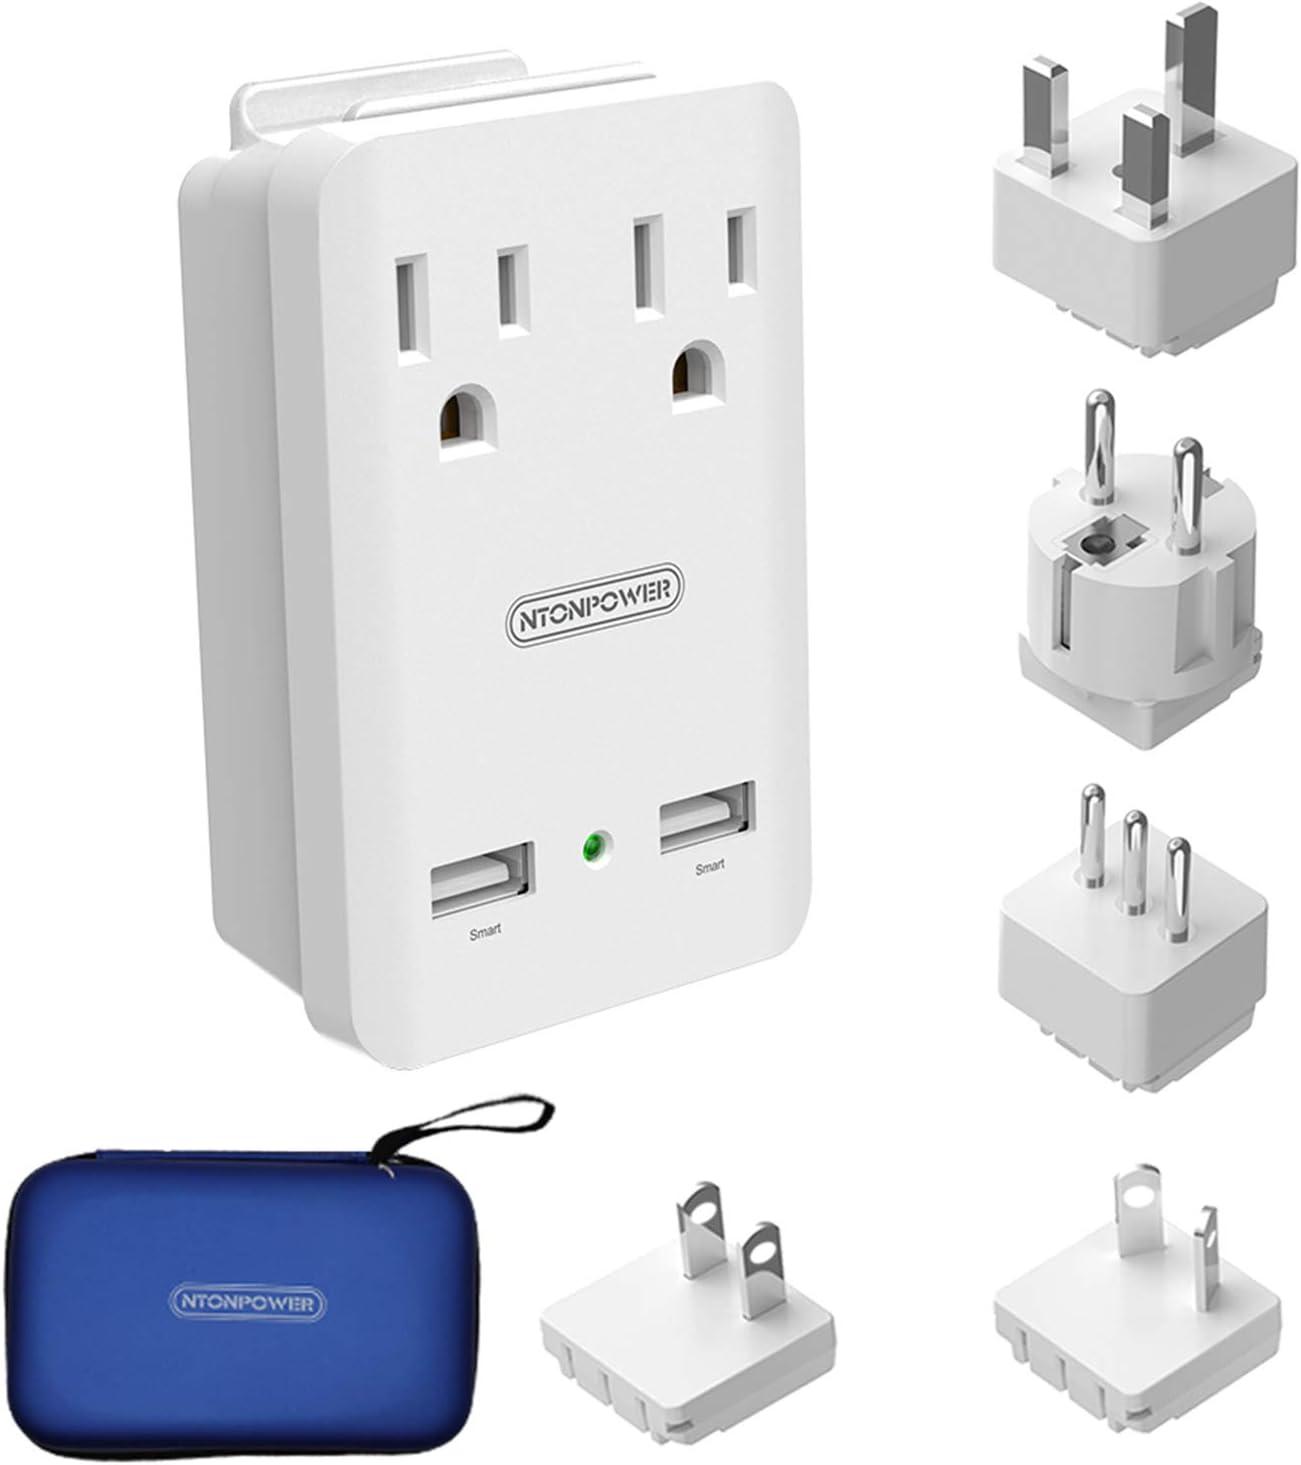 World Travel Adapter Kit - NTONPOWER International Power Adapter, 2 USB Ports 2 Outlets, 2000W Universal Cruise Power Strip with Organizer Case for Europe, Italy, UK, China, Australia, Japan (White)